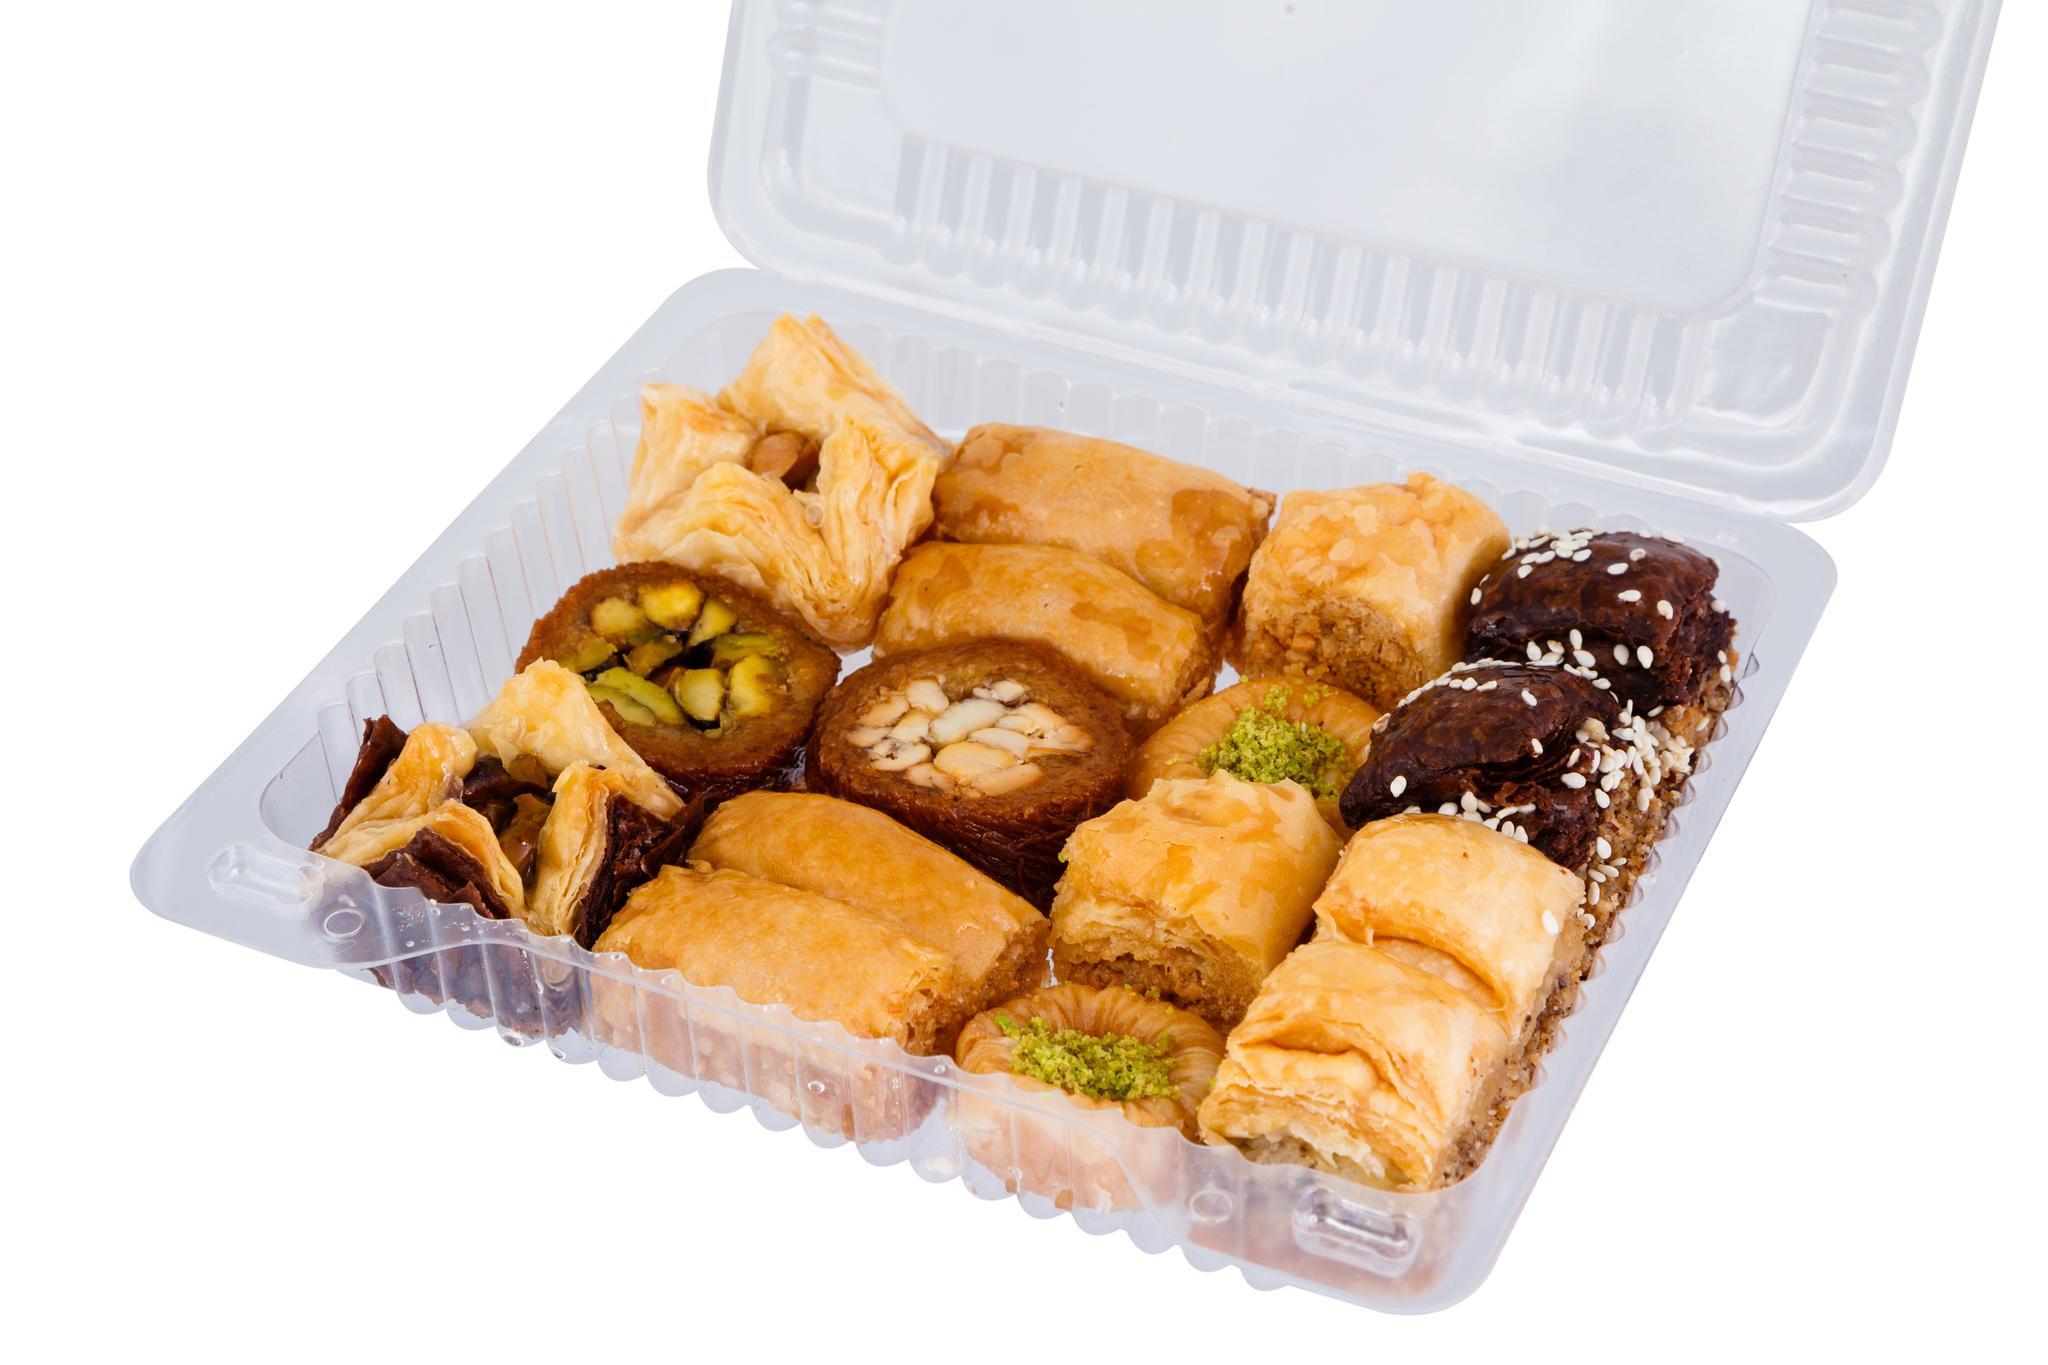 "Pate D'or Пахлава - ассорти ливанских сладостей ""Восток"", 250 г import_files_75_75ecc70e787e11e799f3606c664b1de1_406034222e9611e8a993484d7ecee297.jpg"